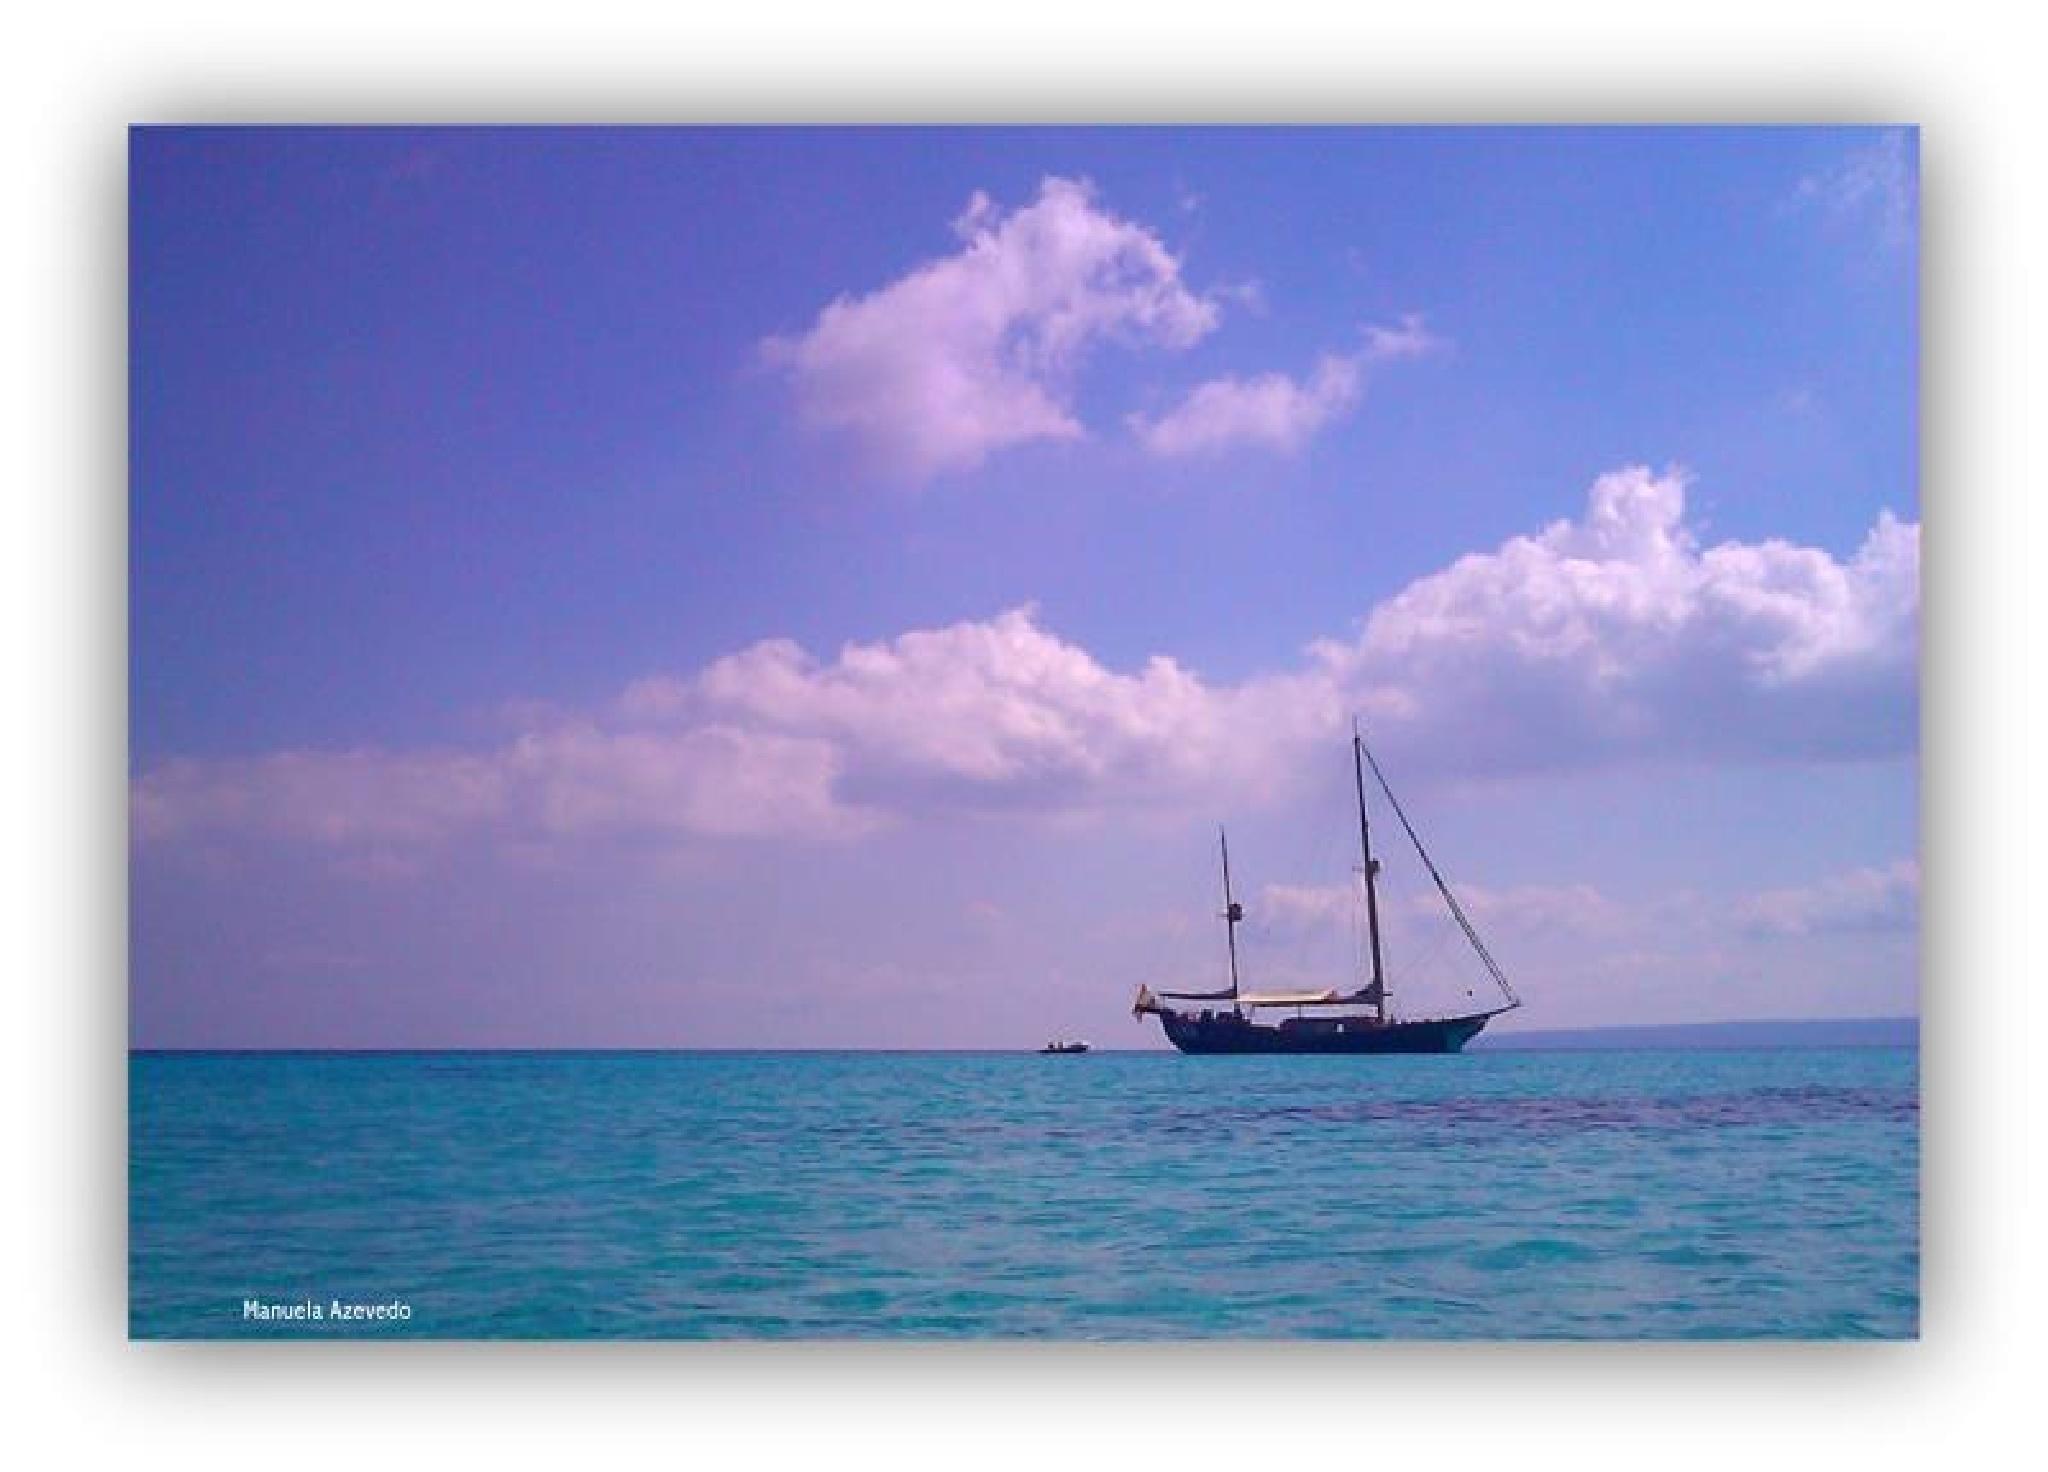 Sea of tranquility by Manuela Azevedo